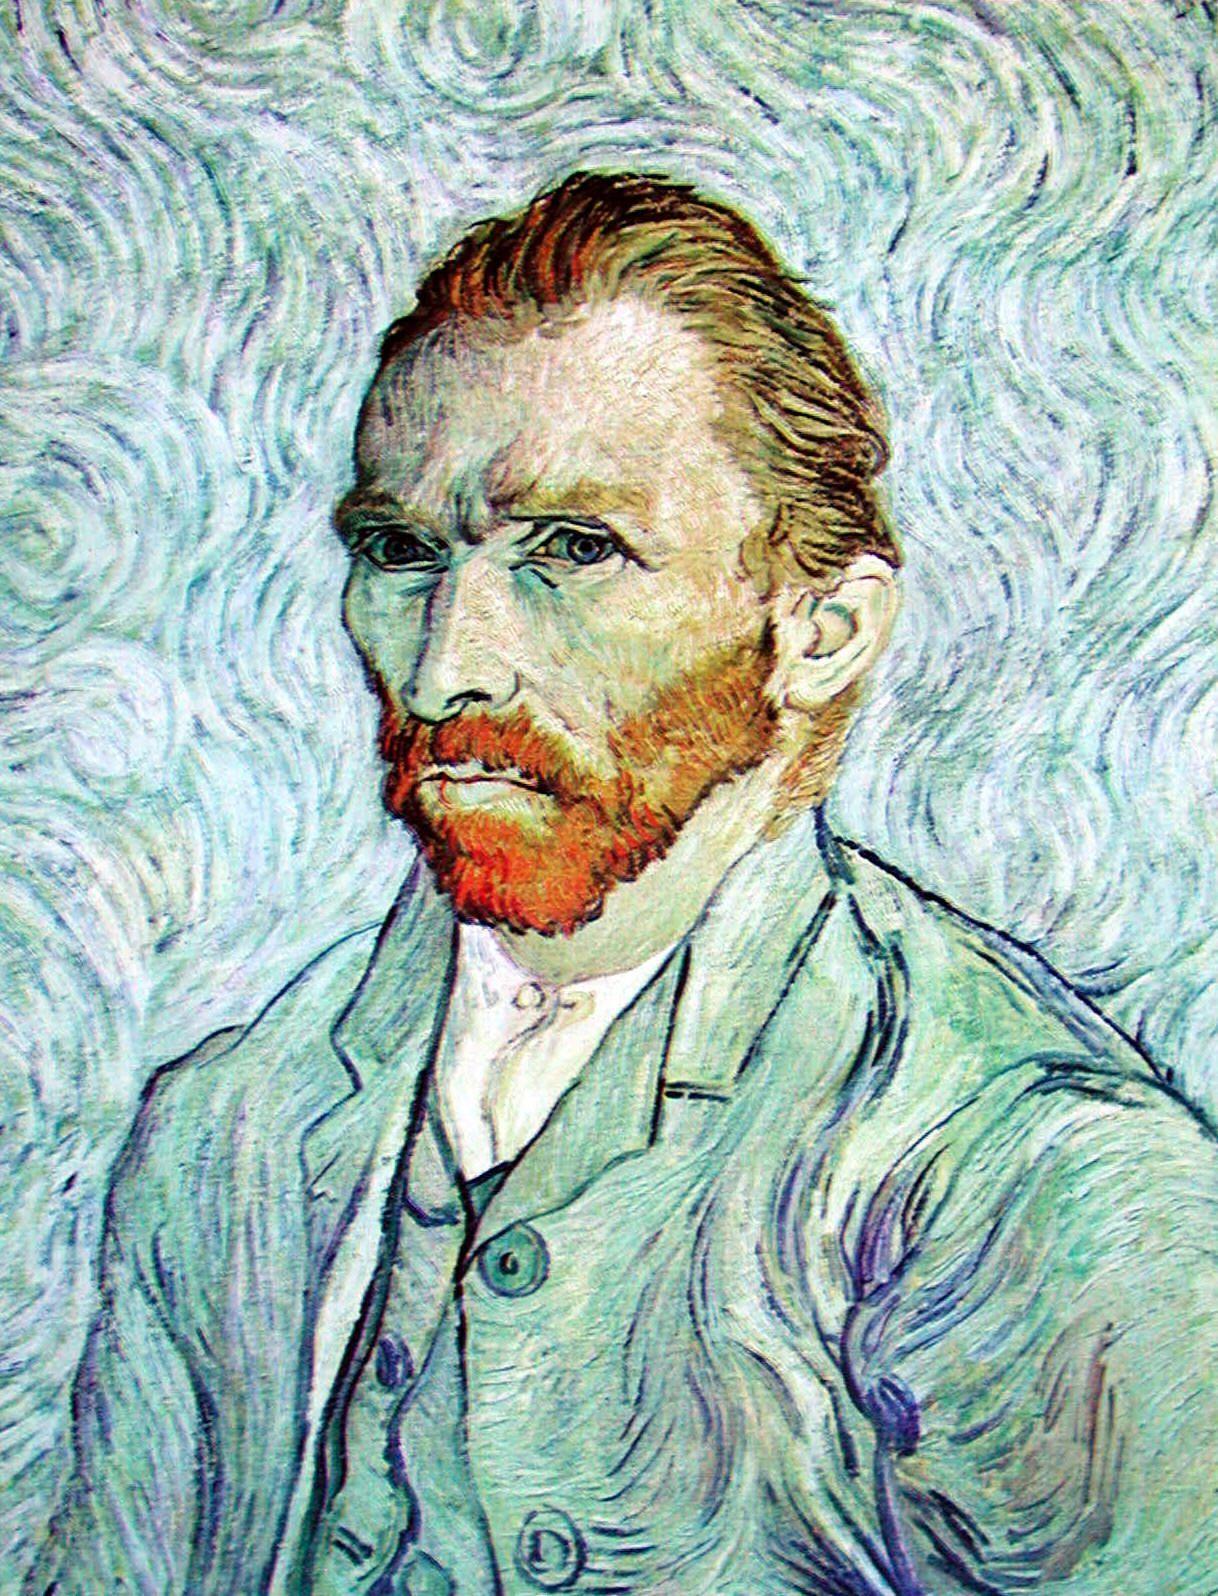 9c9598f9338a3 Título  Autorretrato. Autor  Vincent Van Gogh Técnica  Óleo sobre lienzo  Dimensiones  Alt. 65 cm  Anch. 54